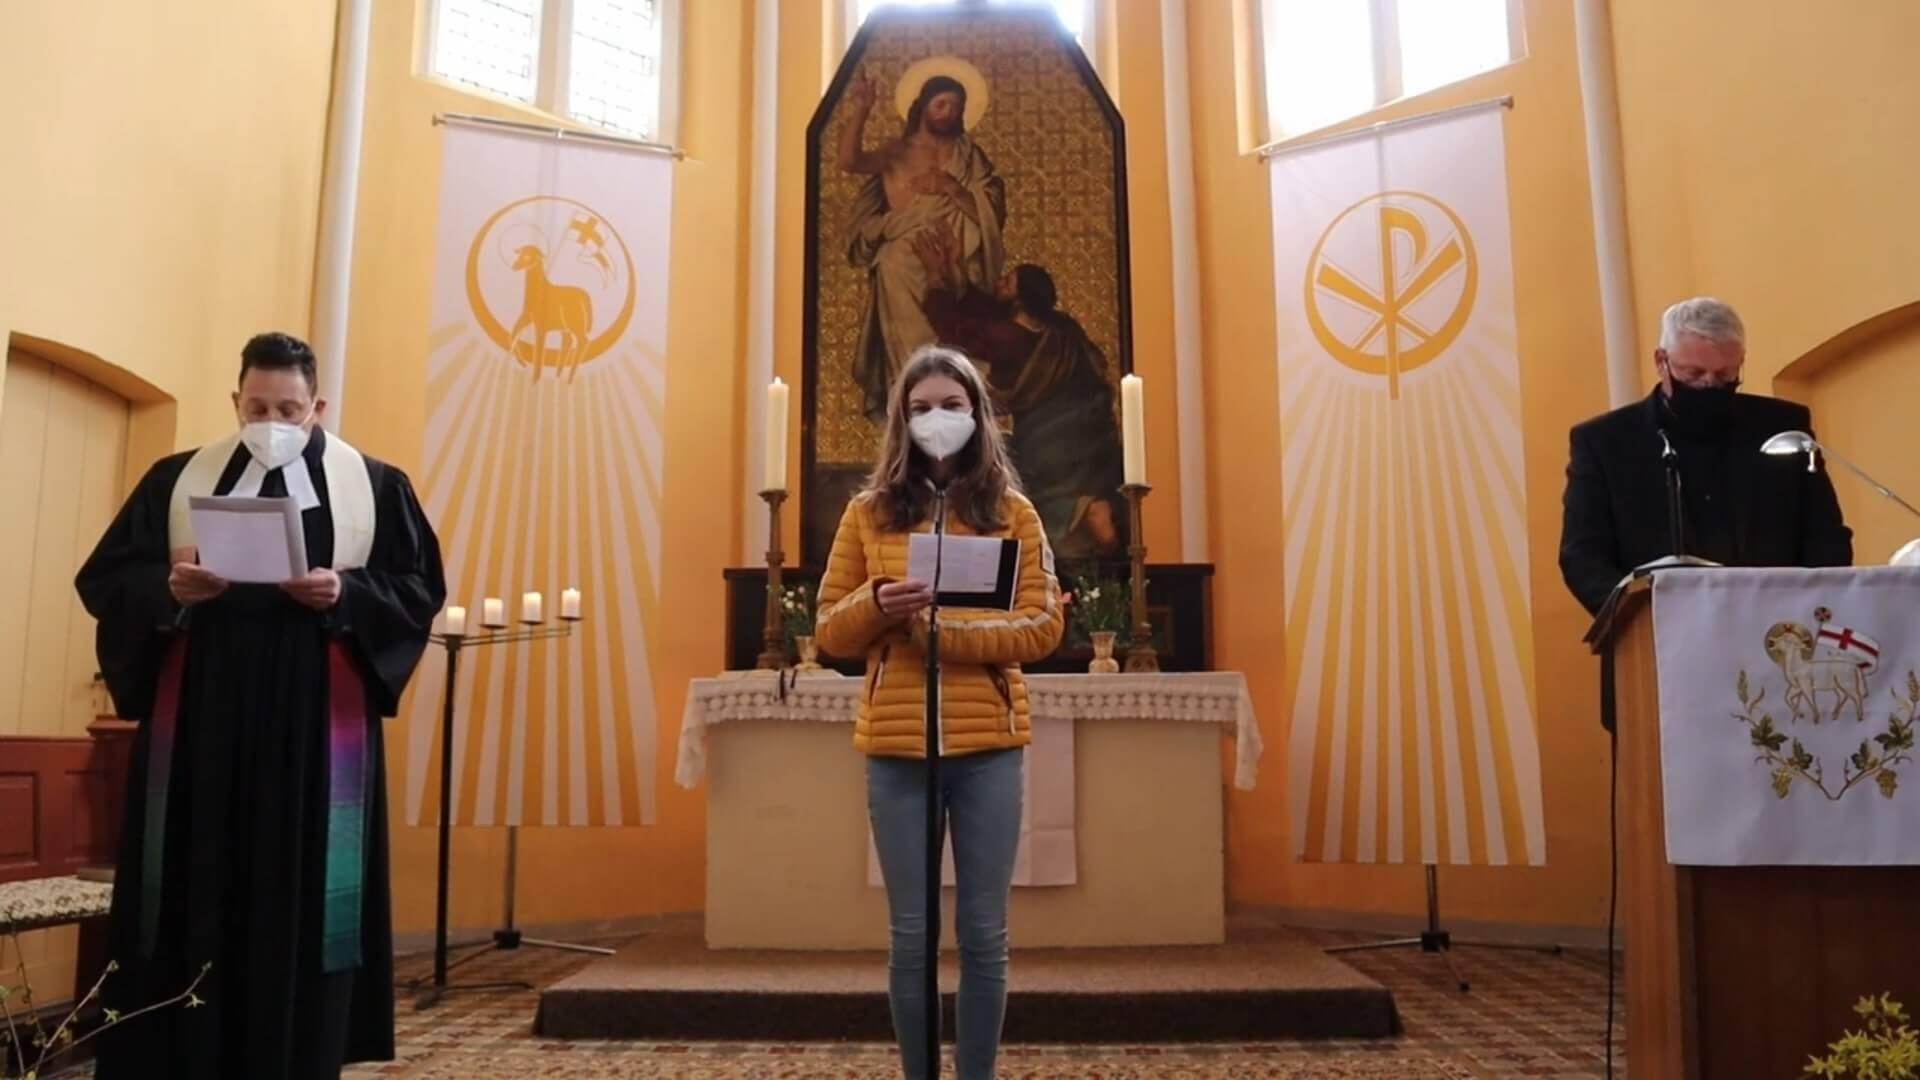 Kirche Penkun Ostersonntag 2021 (1)